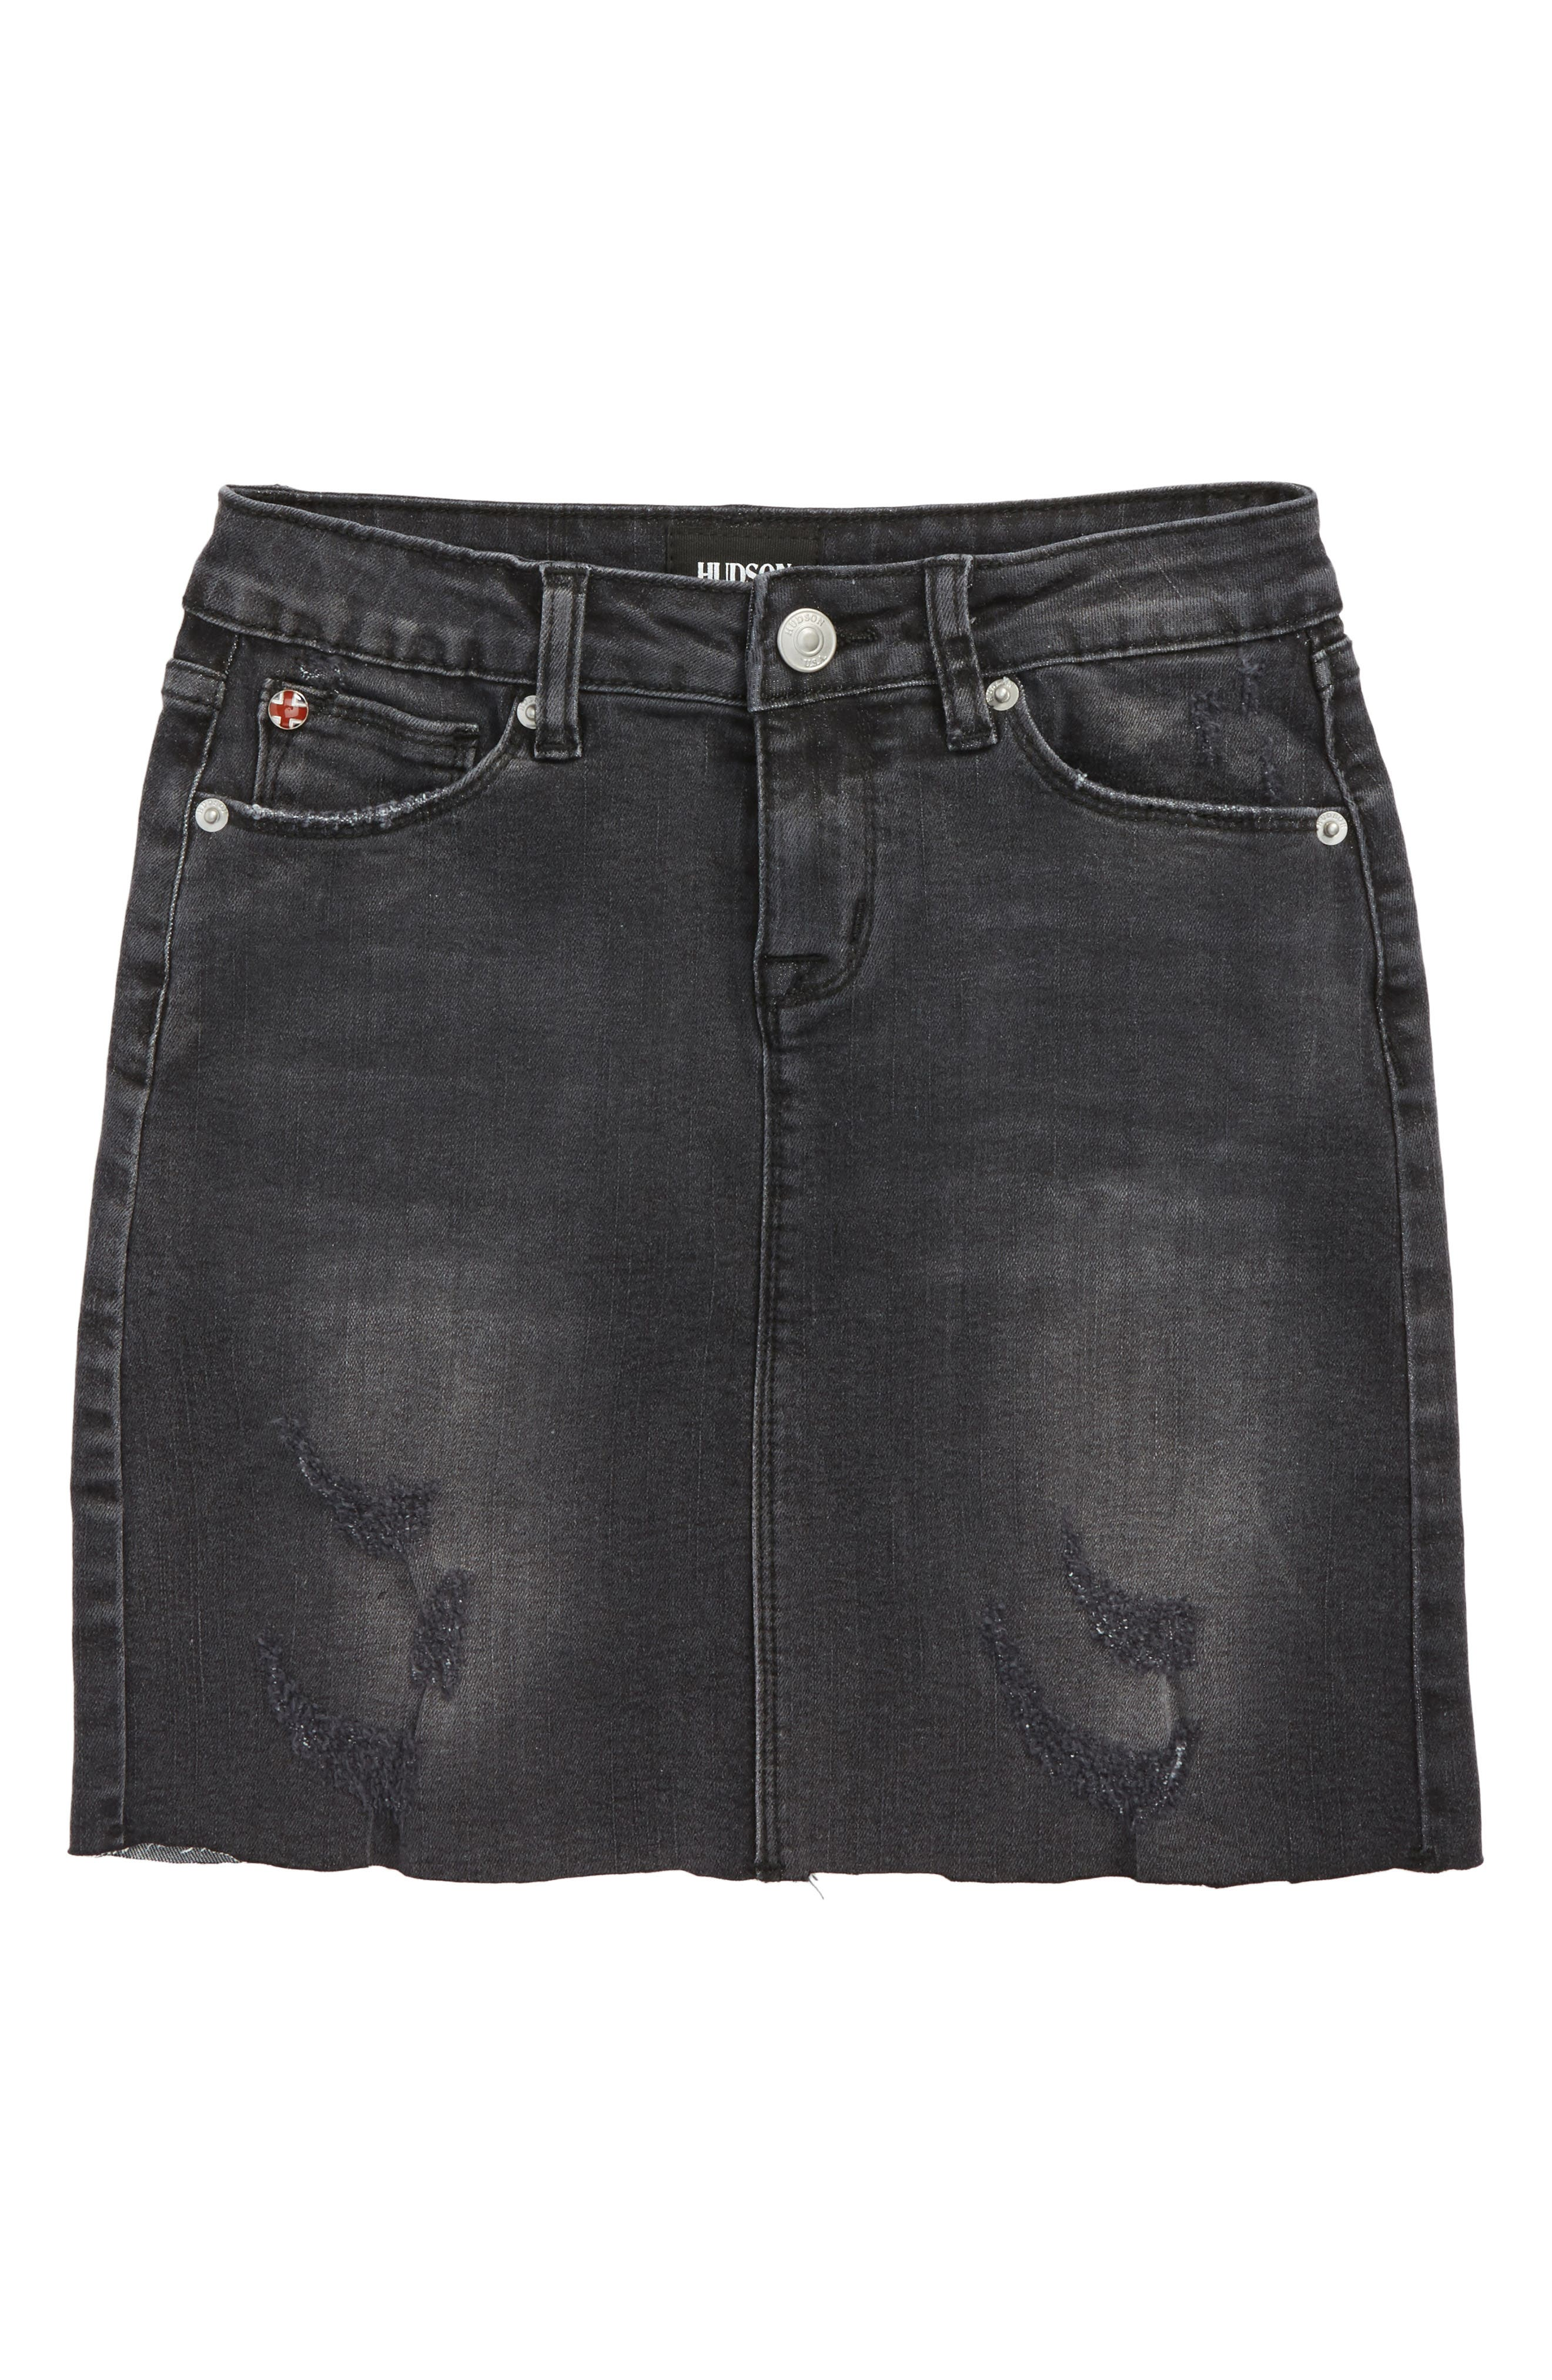 Tara Cutoff Denim Skirt,                         Main,                         color, 001